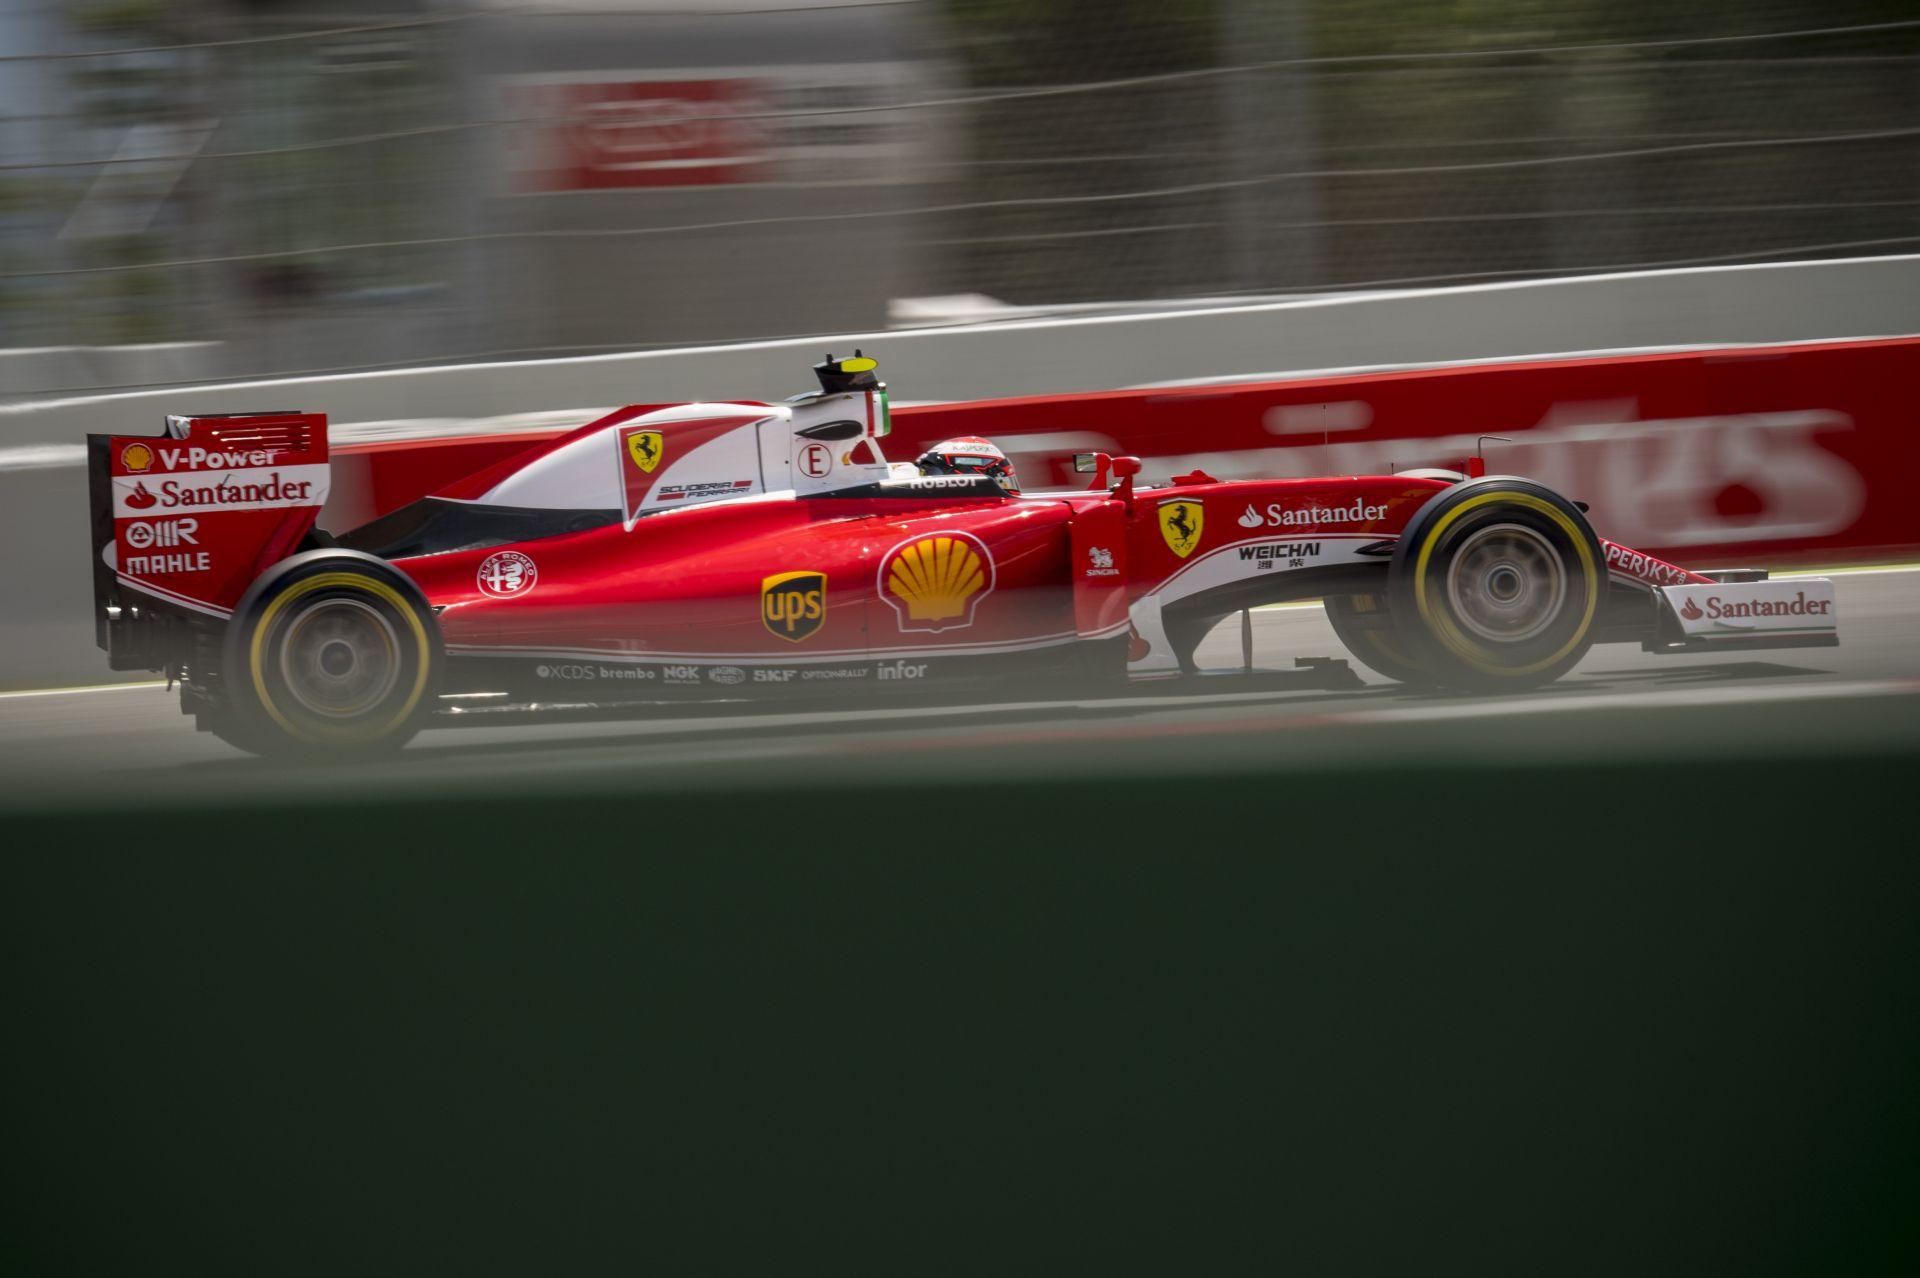 Egy kameraképen: Raikkönen Verstappen, Ricciardo Vettel ellen